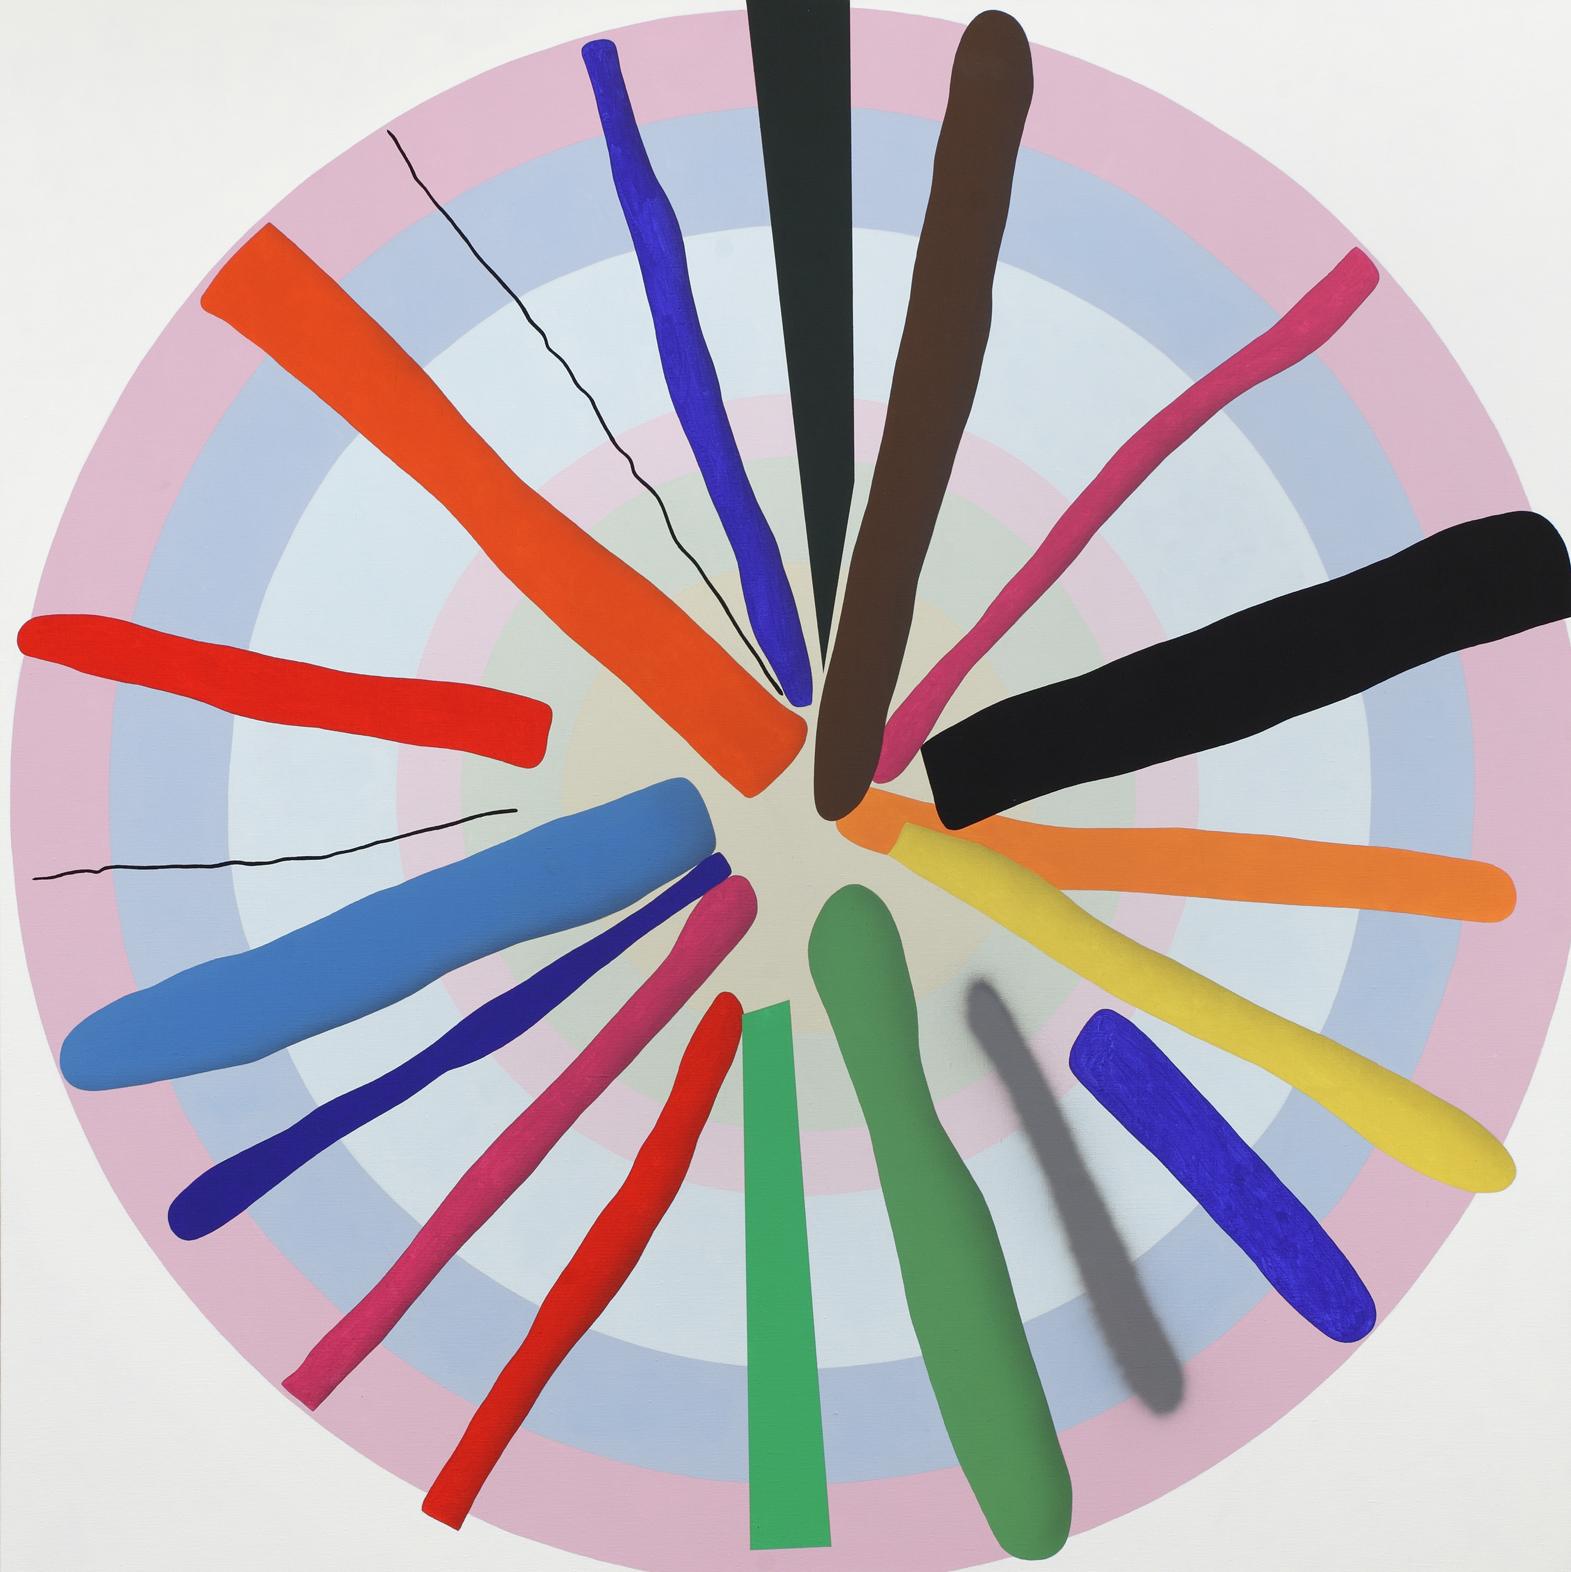 Mandala No. 3, 2011, acrylic on canvas, 200 x 200 cm